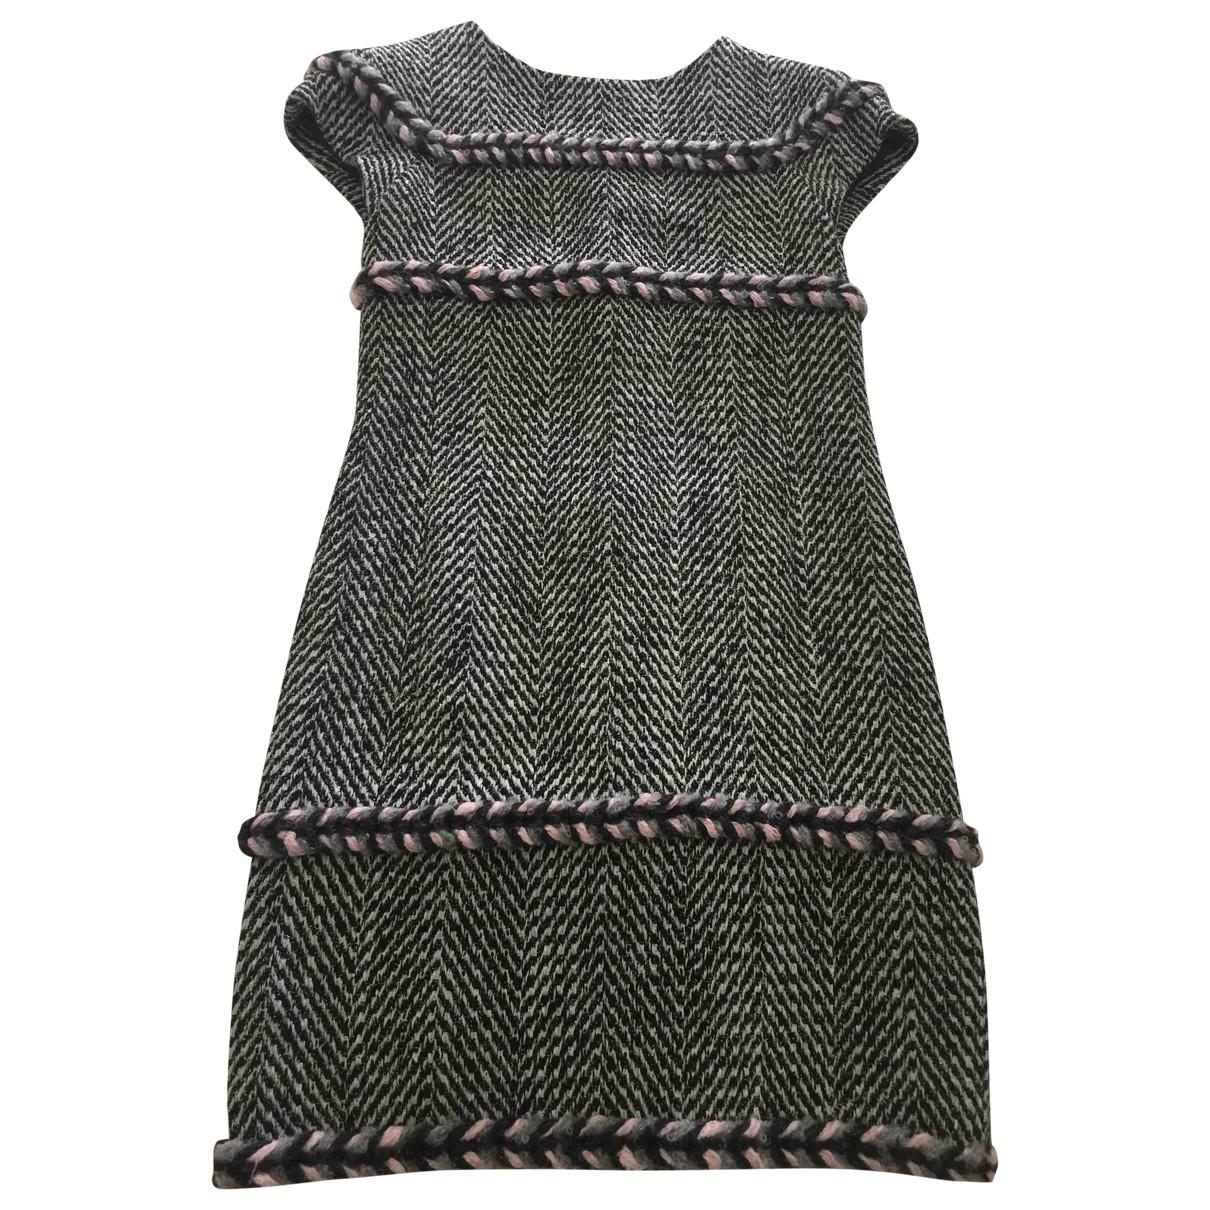 Chanel \N Multicolour Tweed dress for Women 36 FR